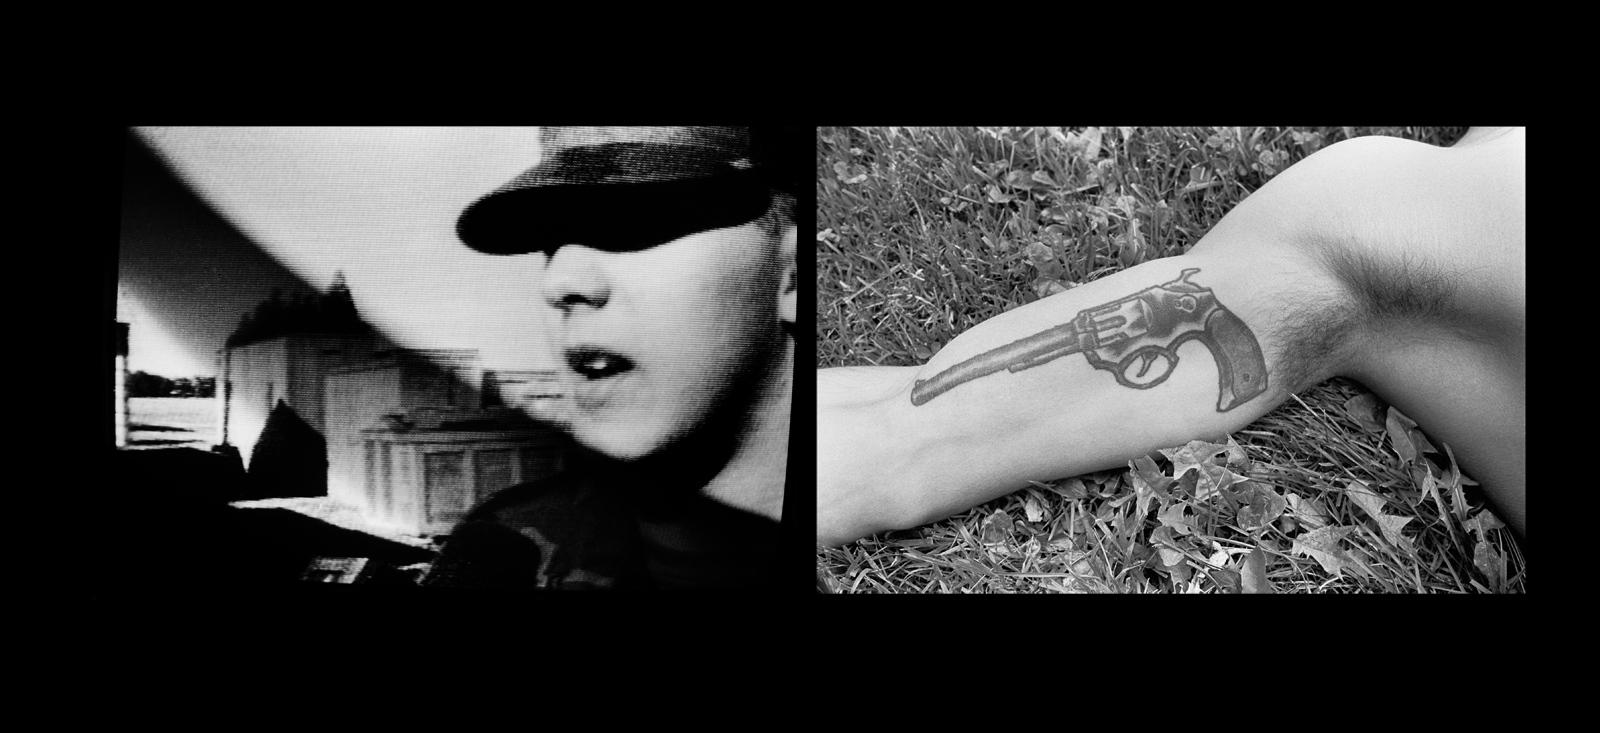 Art and Documentary Photography - Loading 5_firearm__sdeswaan.jpg